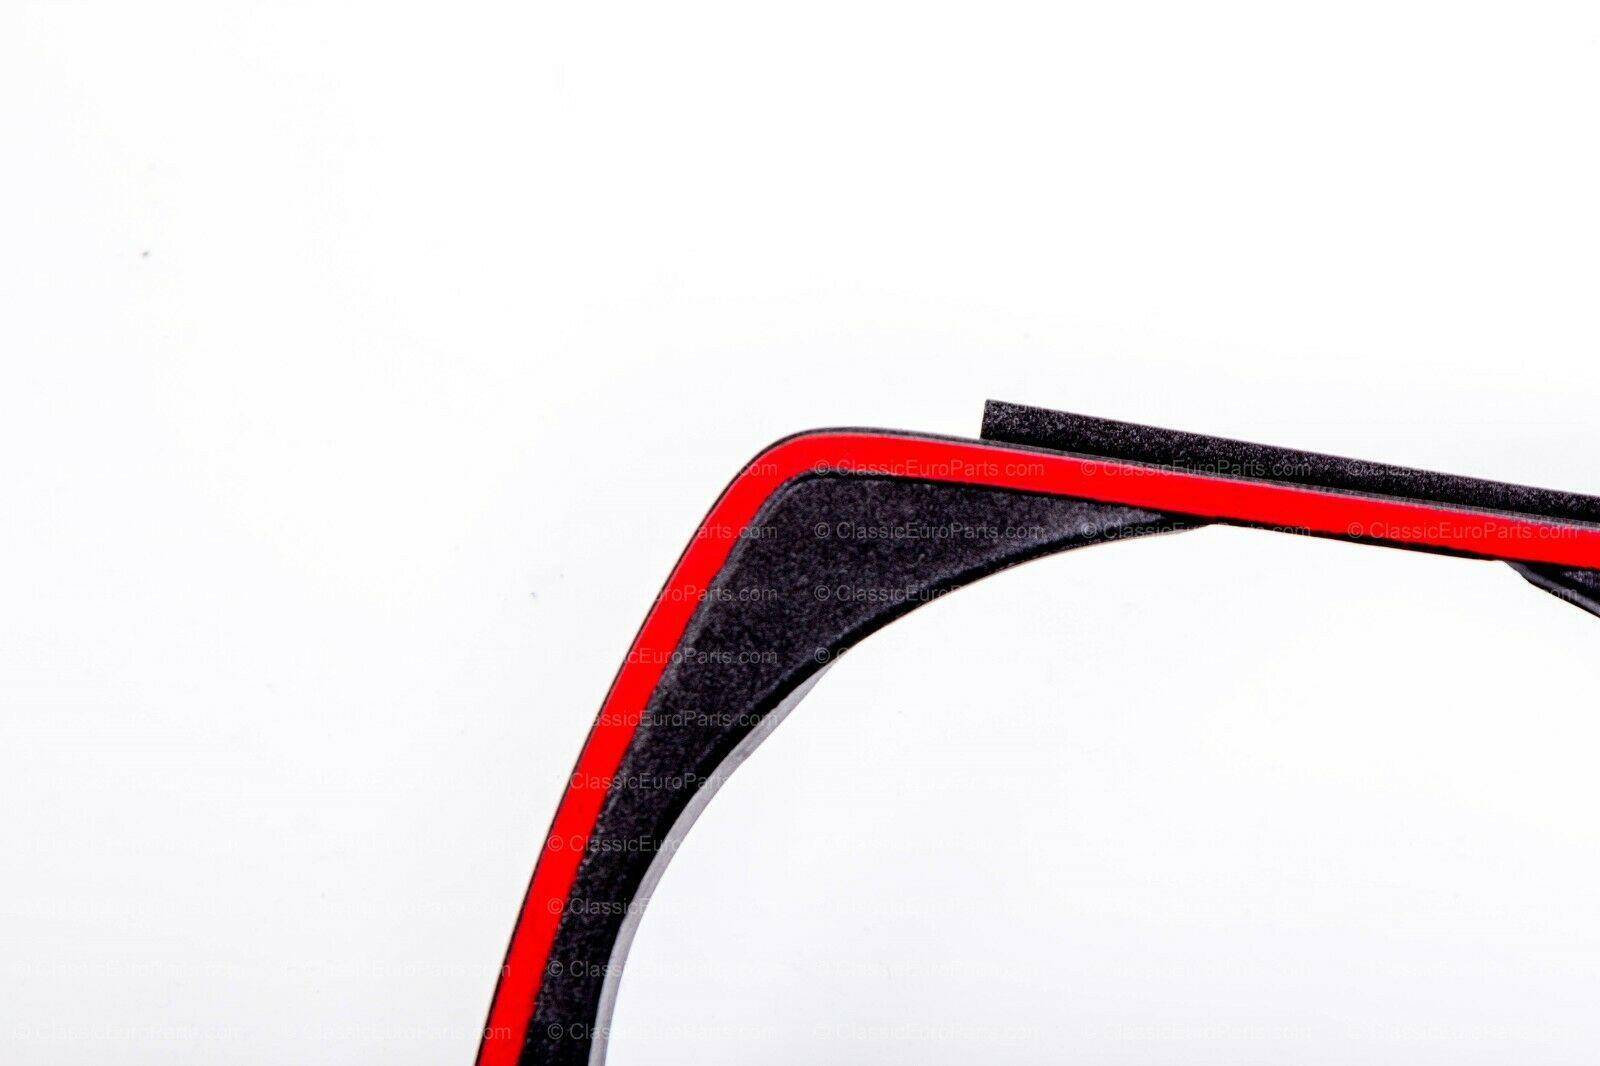 vw golf rabbit mk2 euro gti quad headlight grill fog. Black Bedroom Furniture Sets. Home Design Ideas